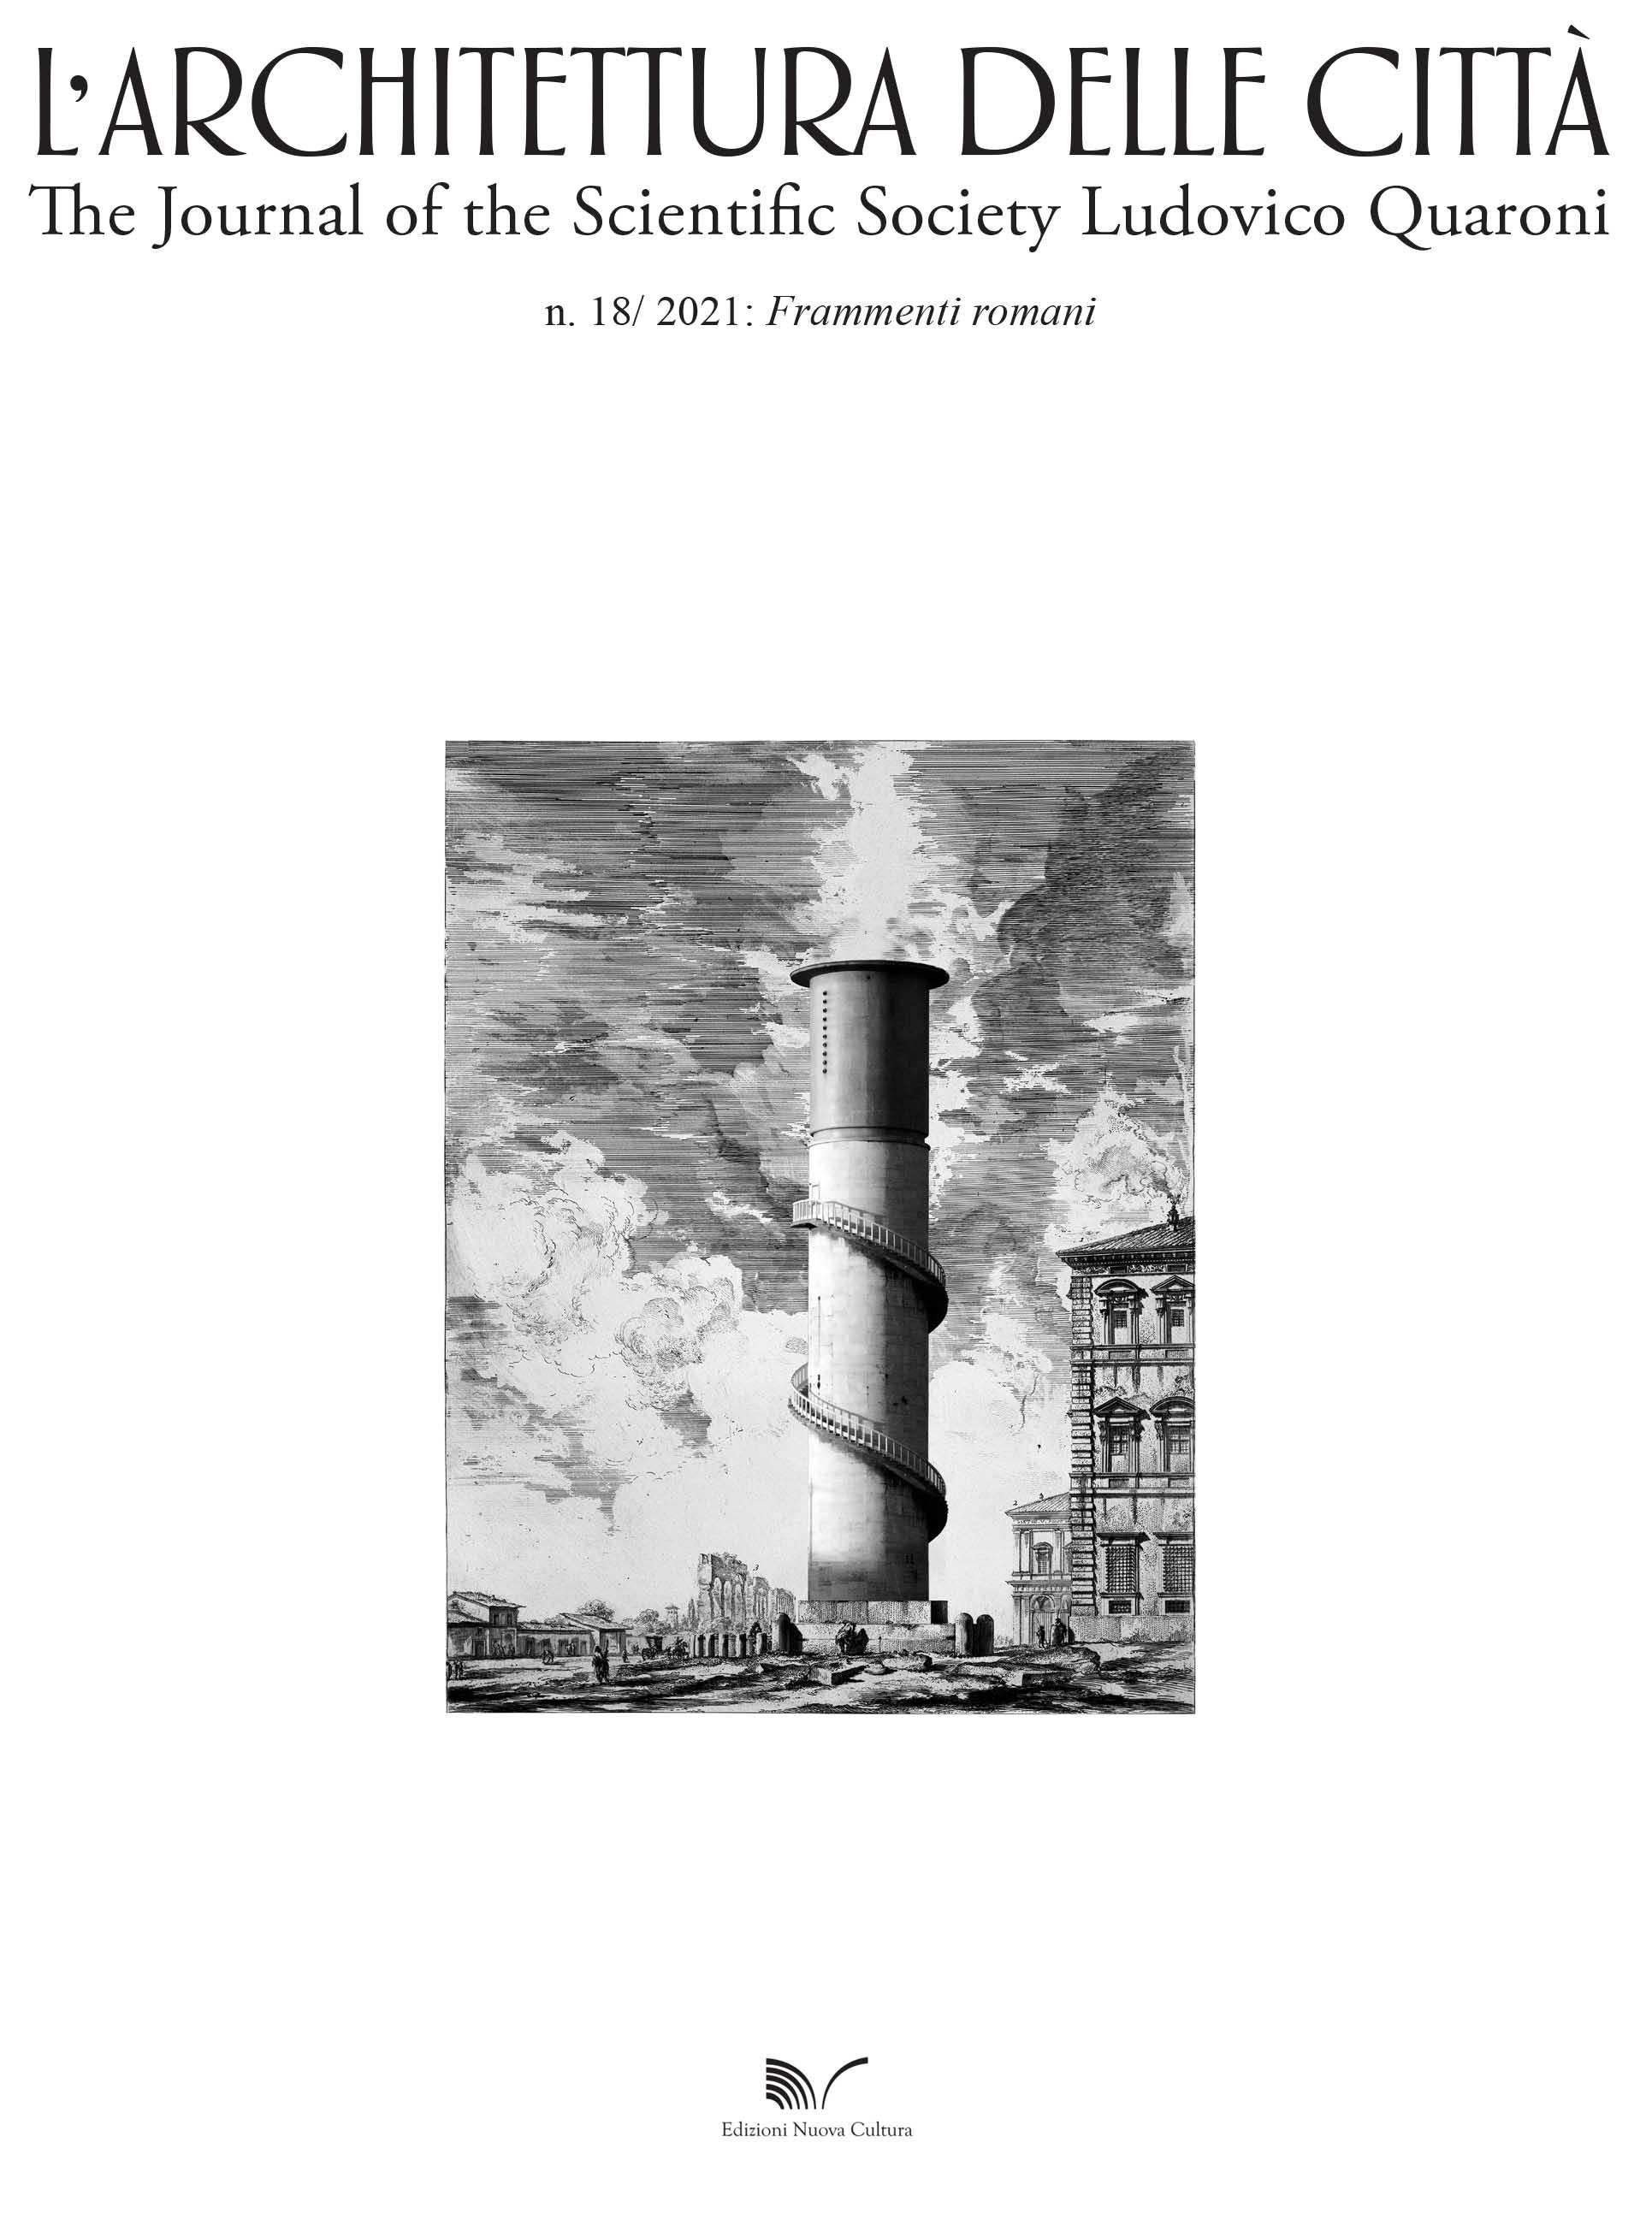 View Vol. 14 No. 18 (2021): Frammenti Romani